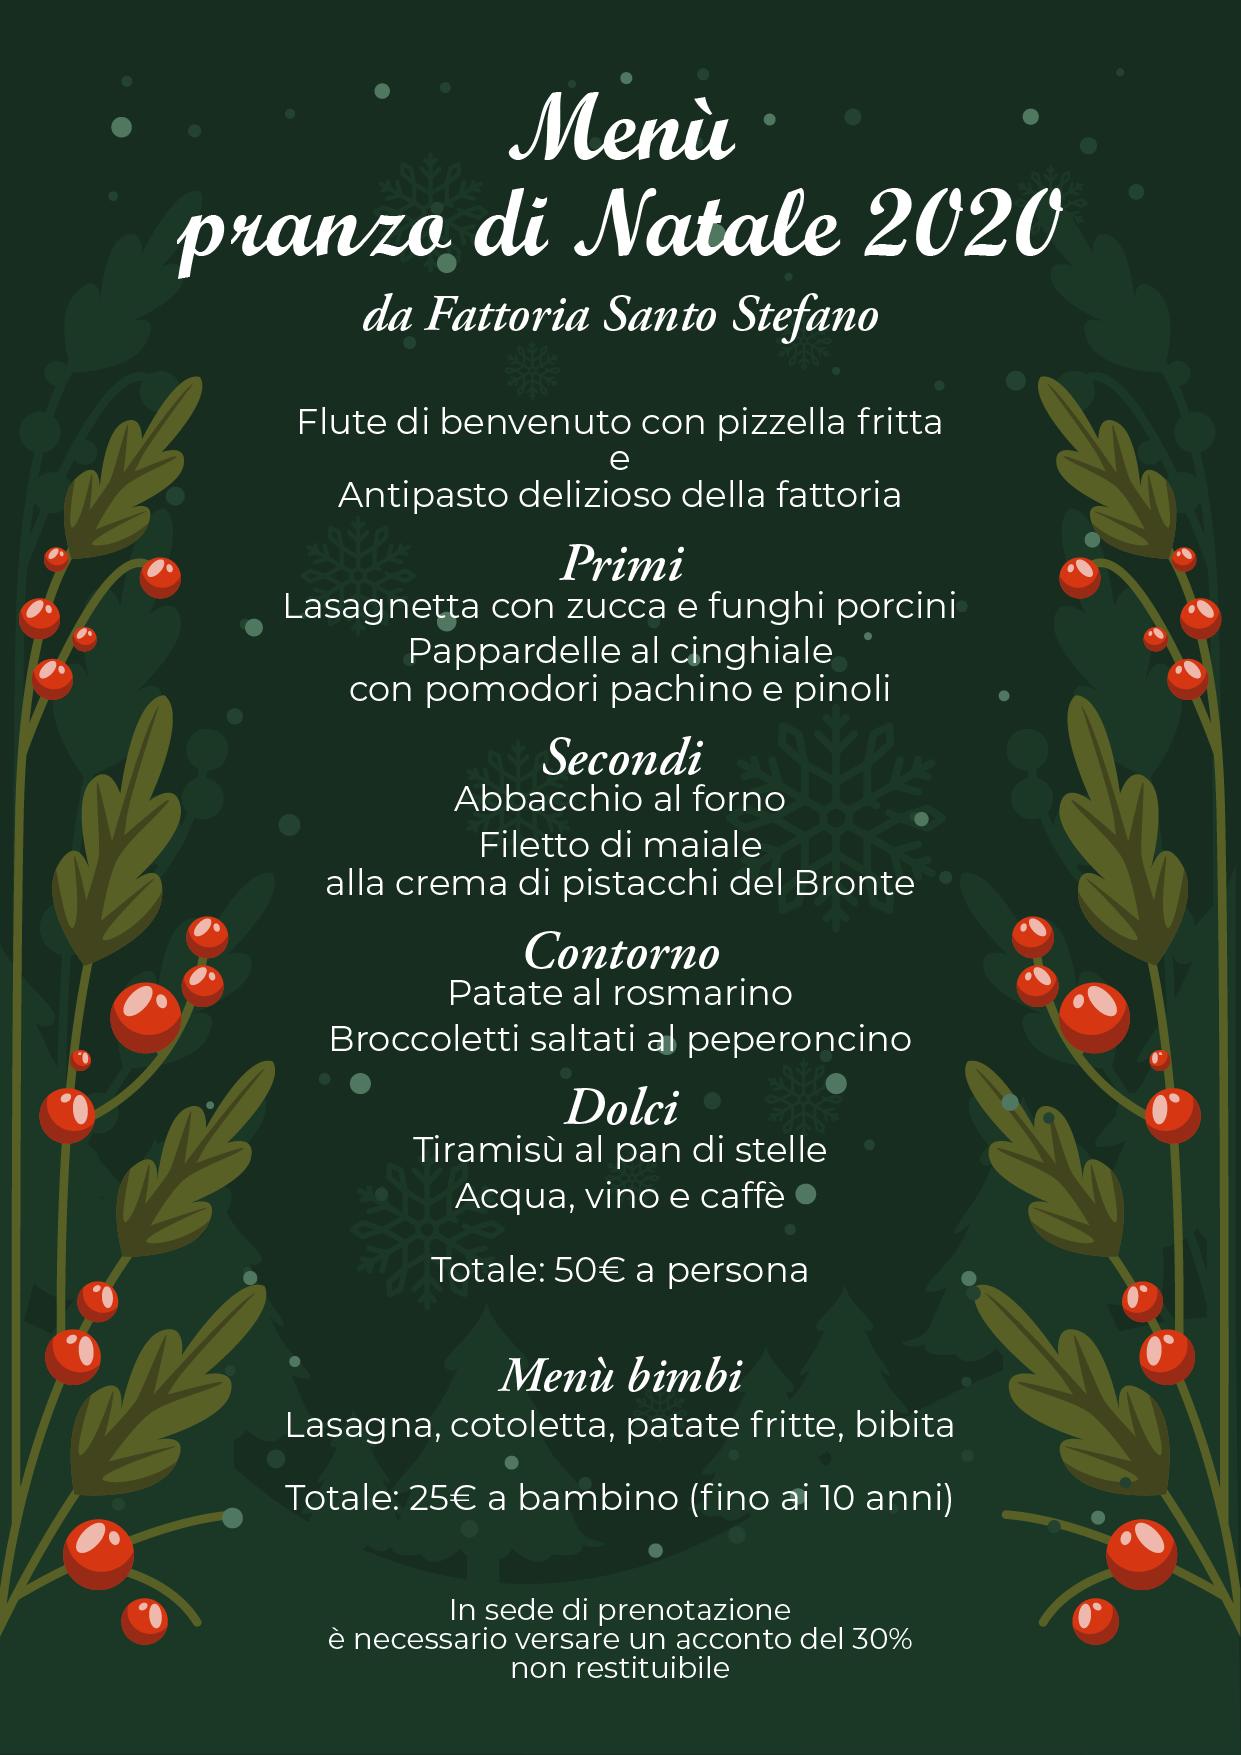 menu pranzo natale 2020